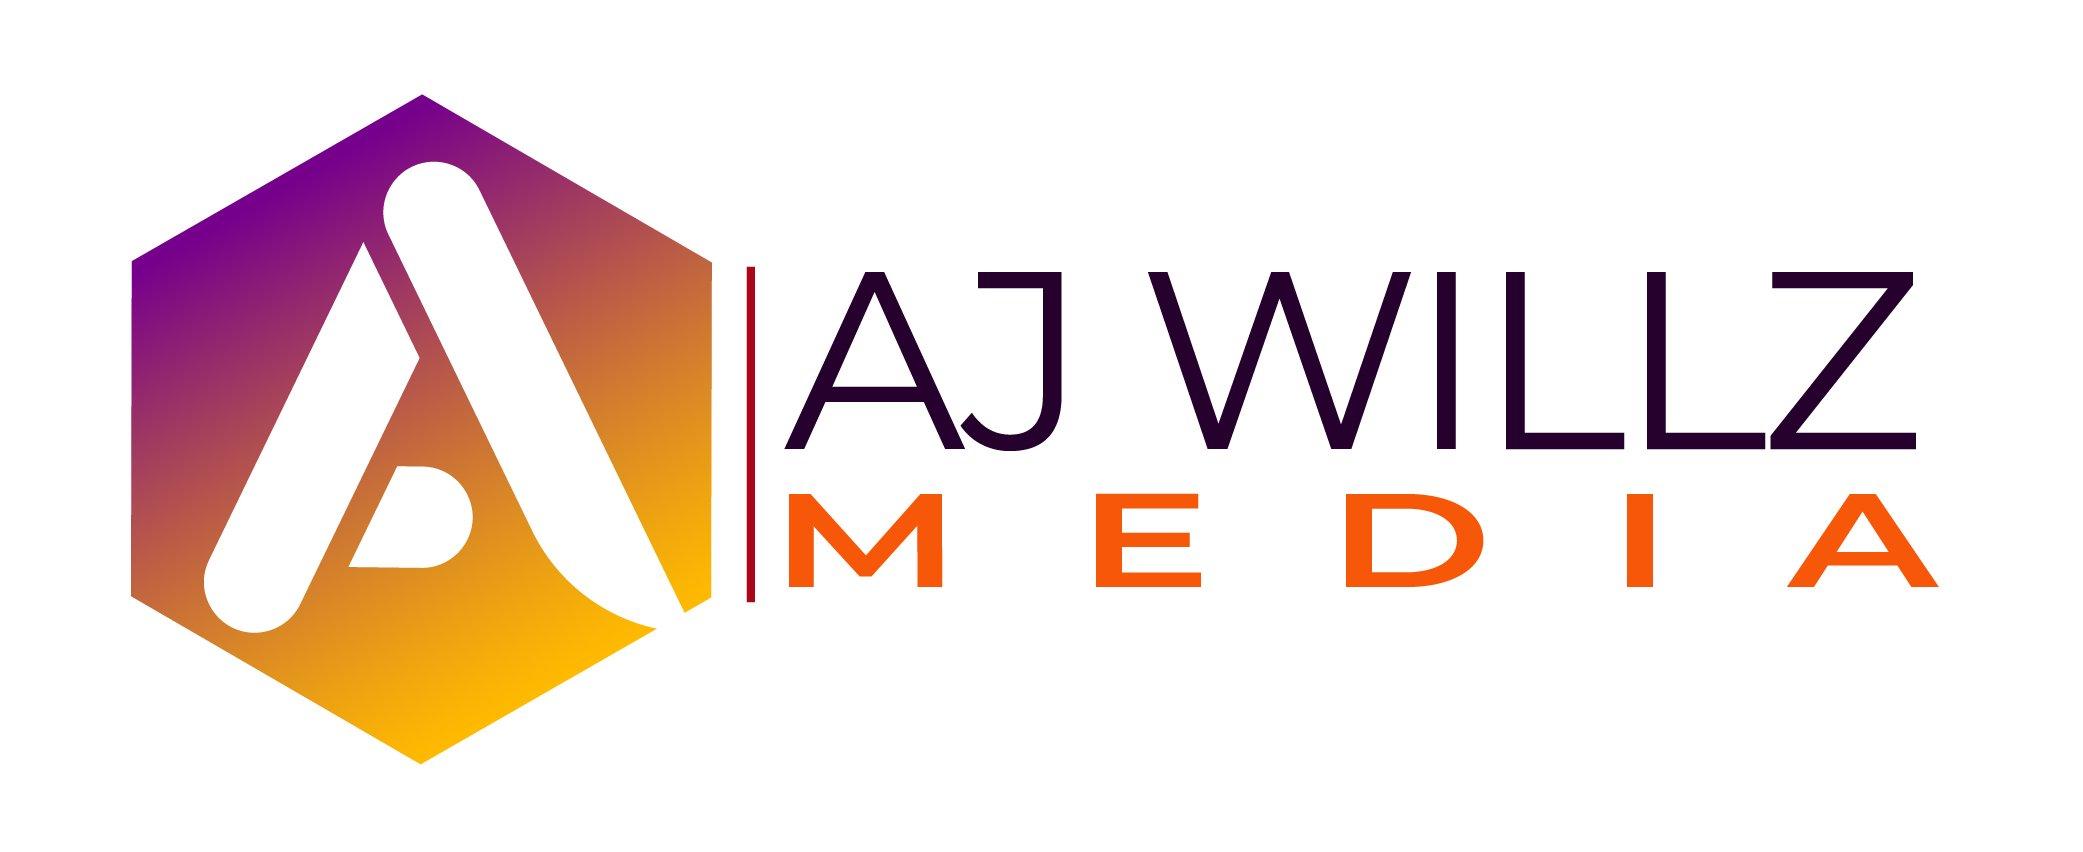 AJ Willz Media Gh